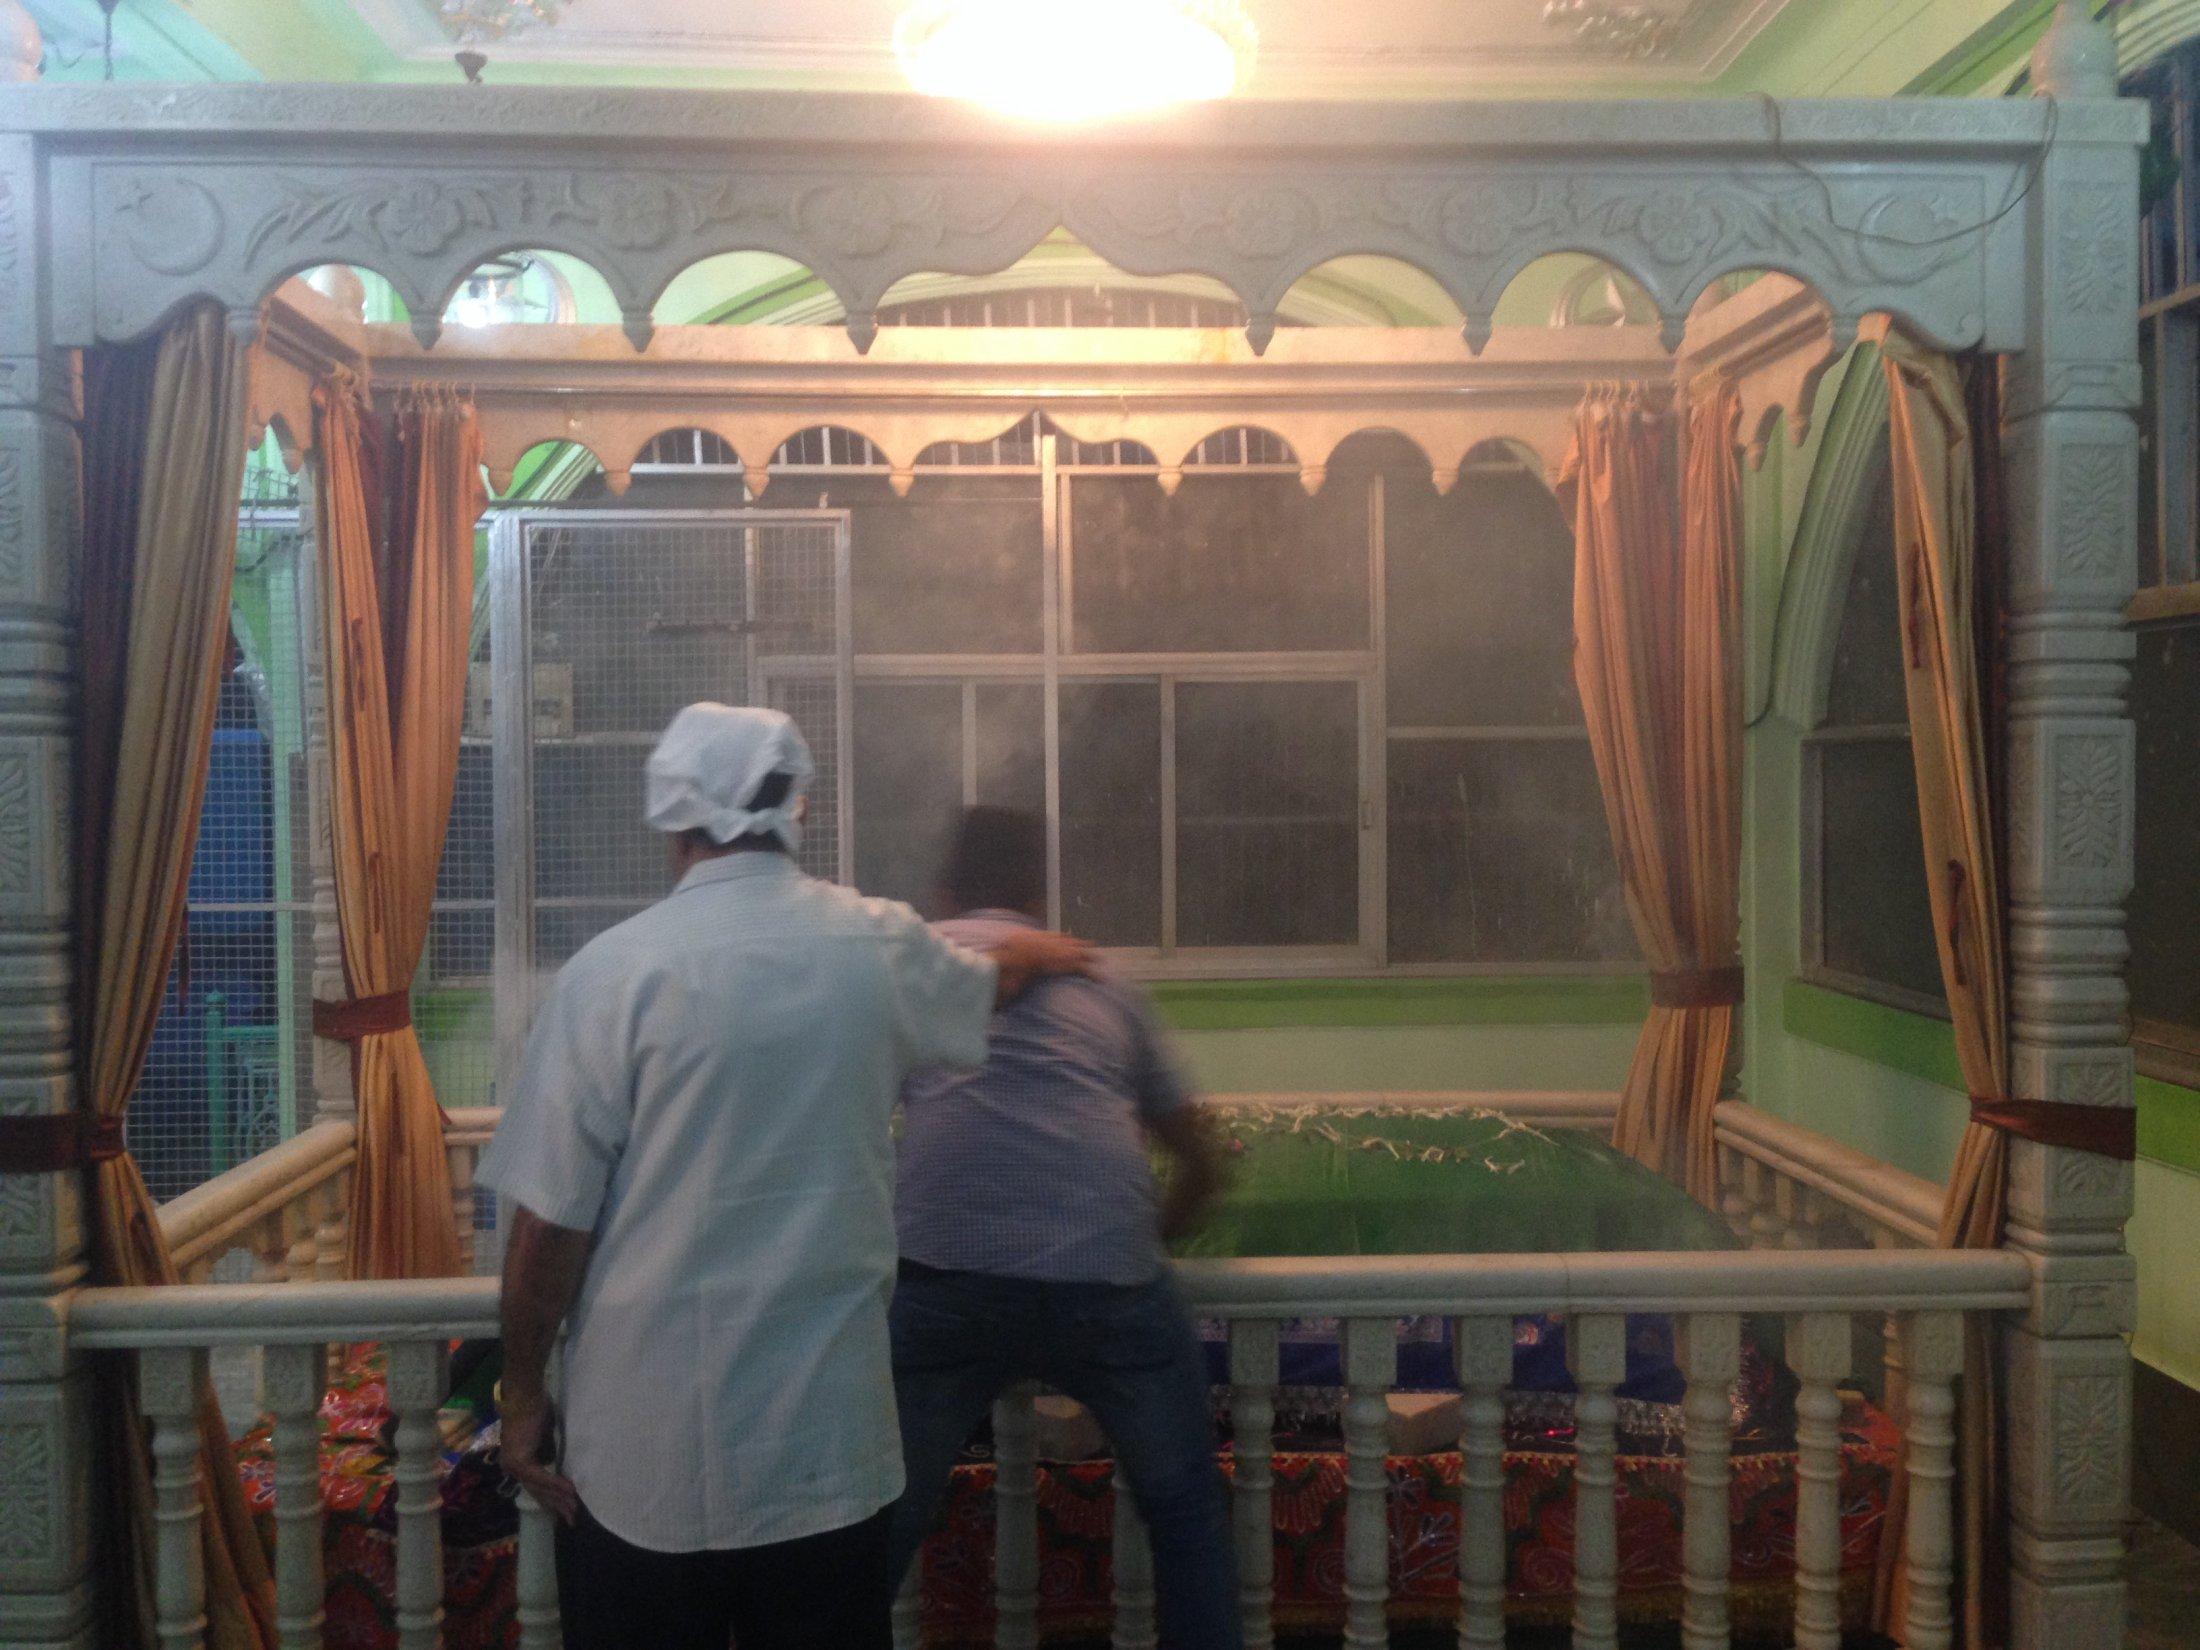 Evening Rituals at the Parsi Chilla for Bava Gor